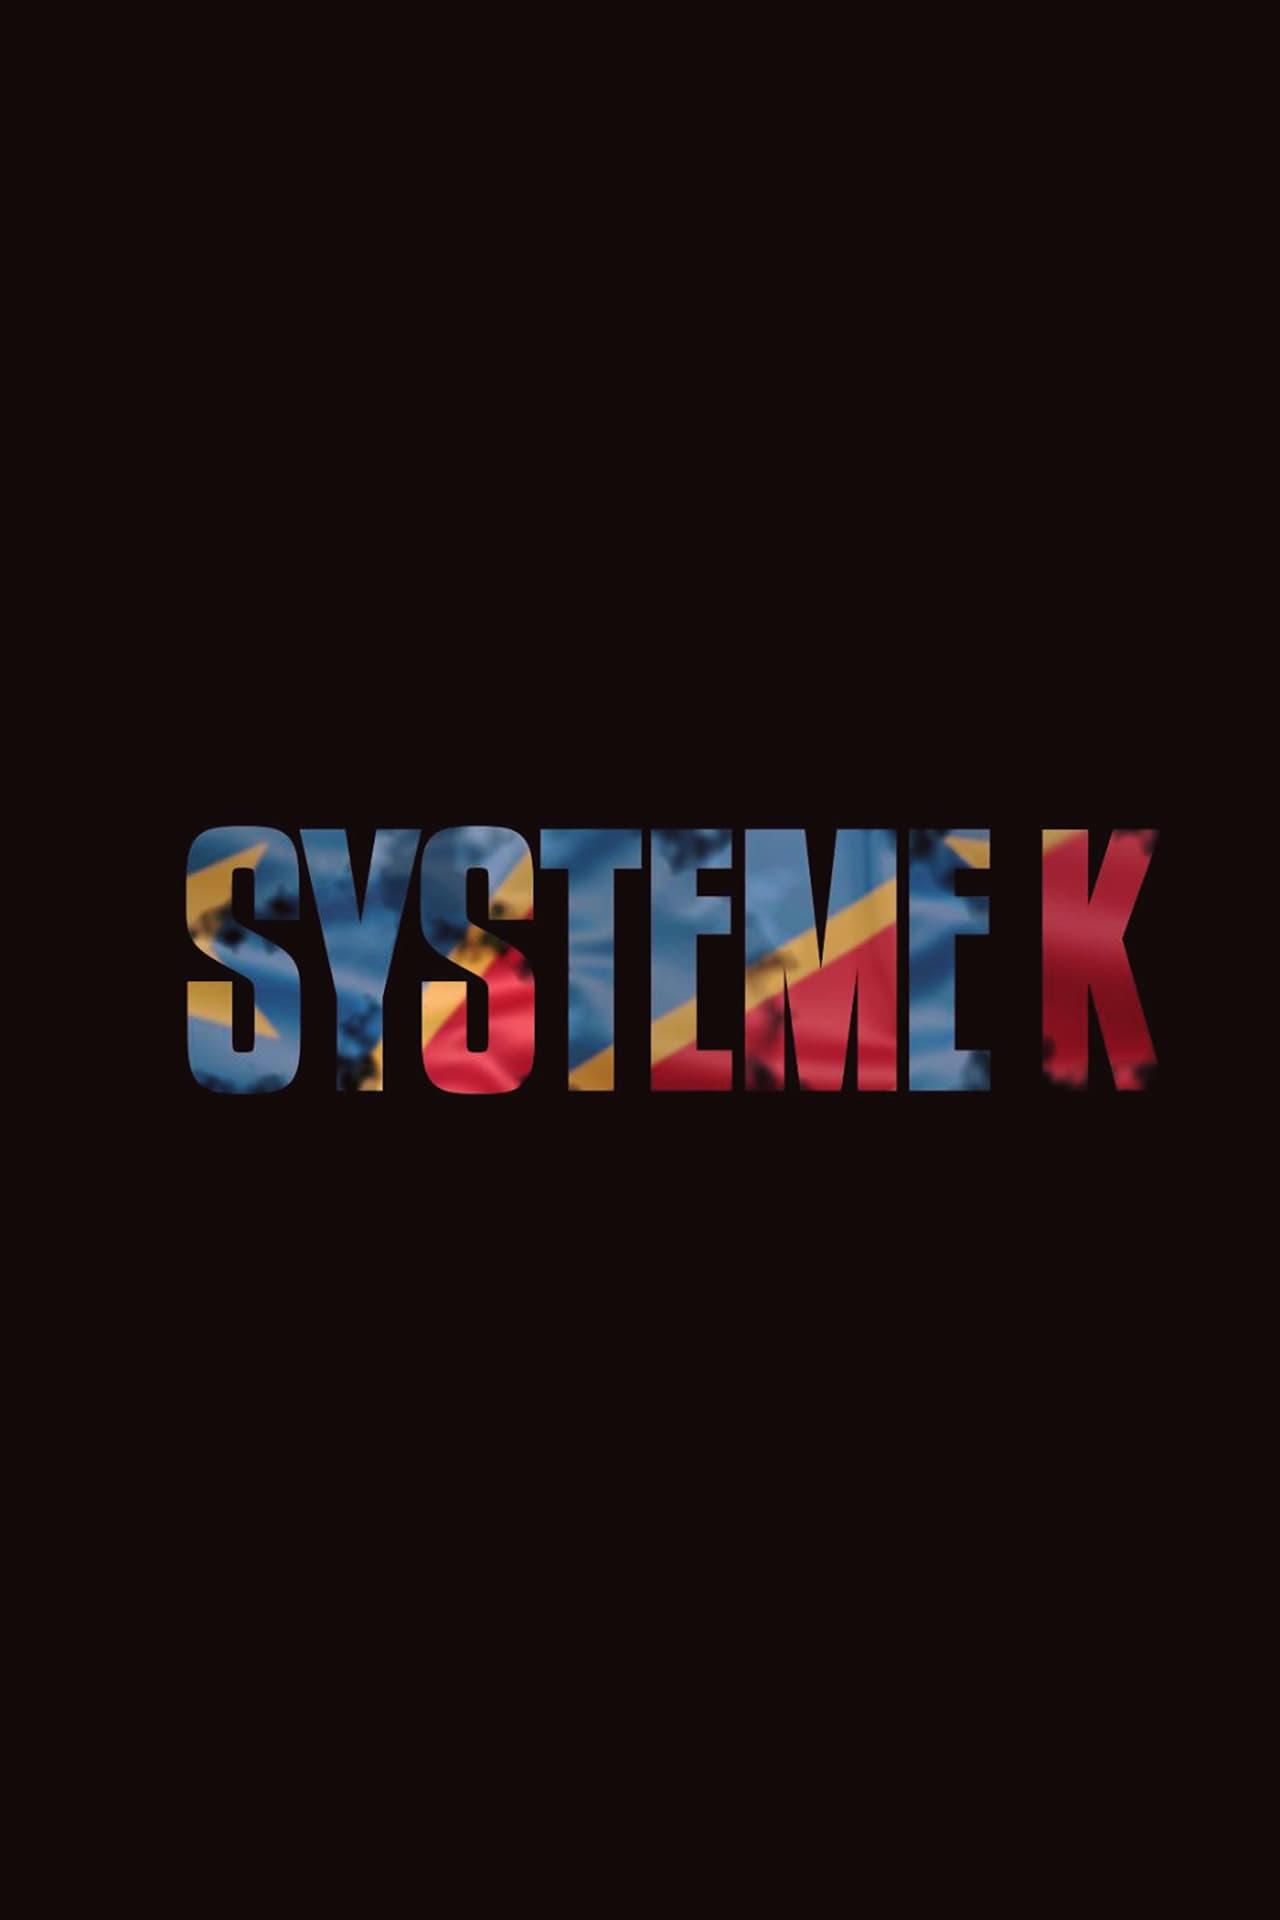 System K